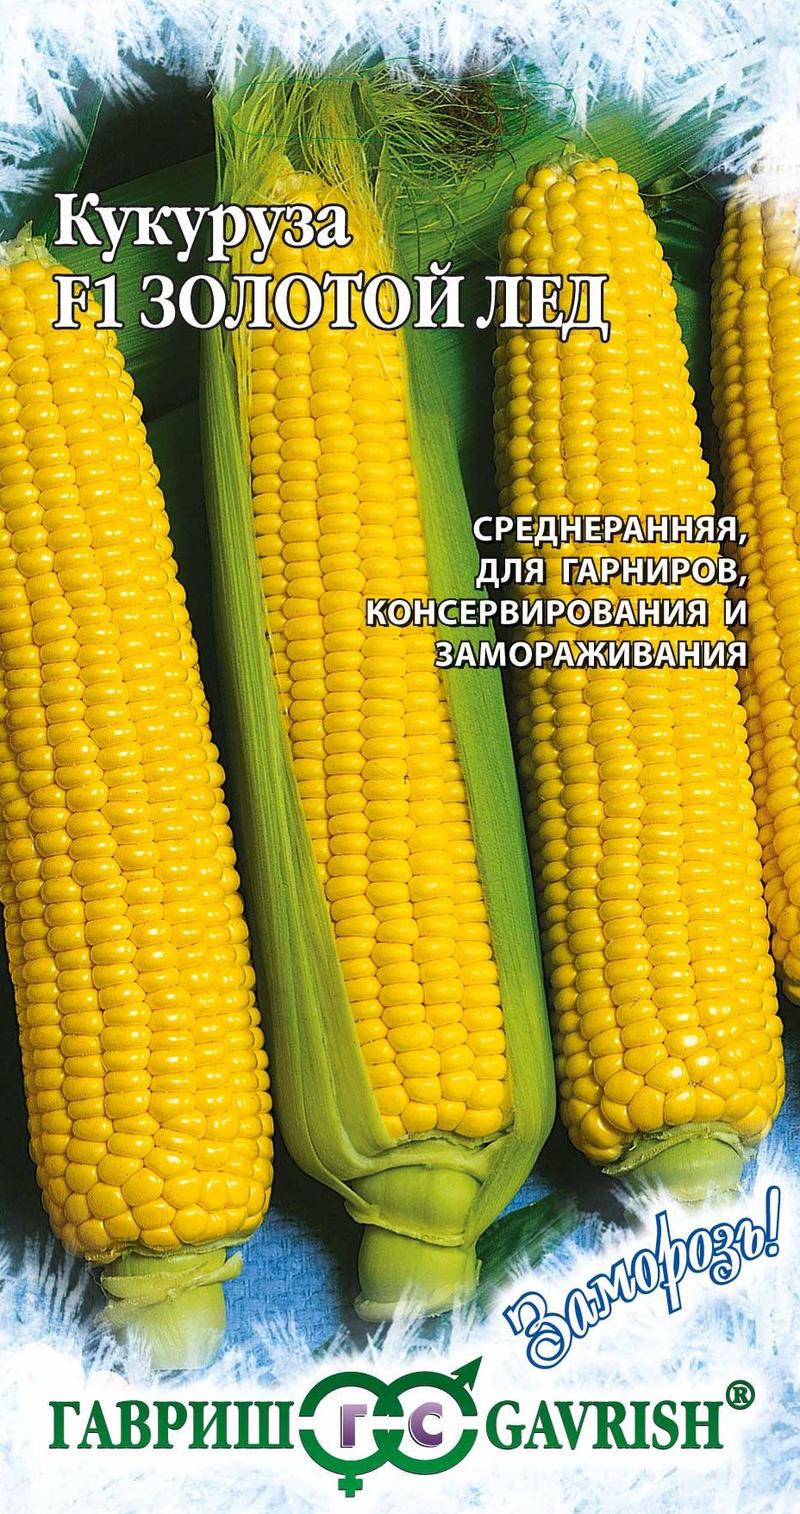 Семена Кукуруза сахарная Золотой лед F1,